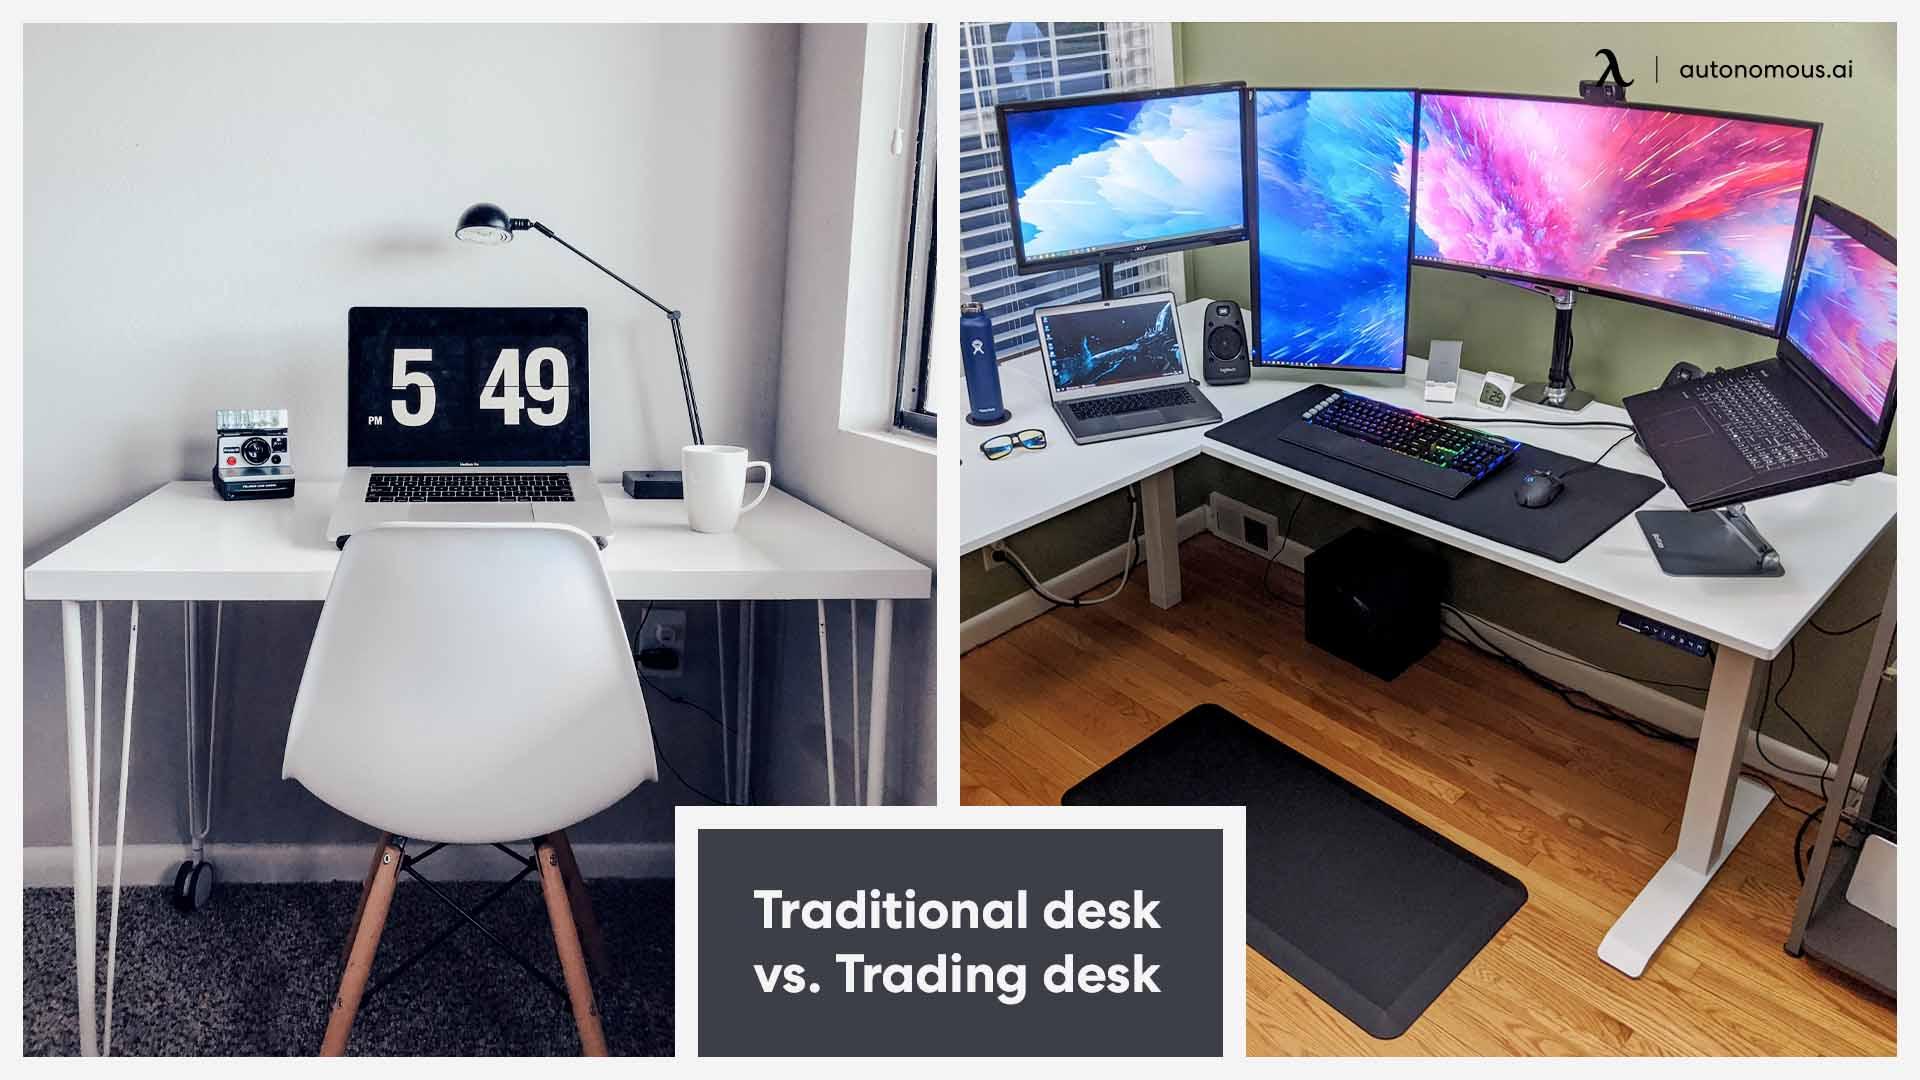 Traditional vs trading desk